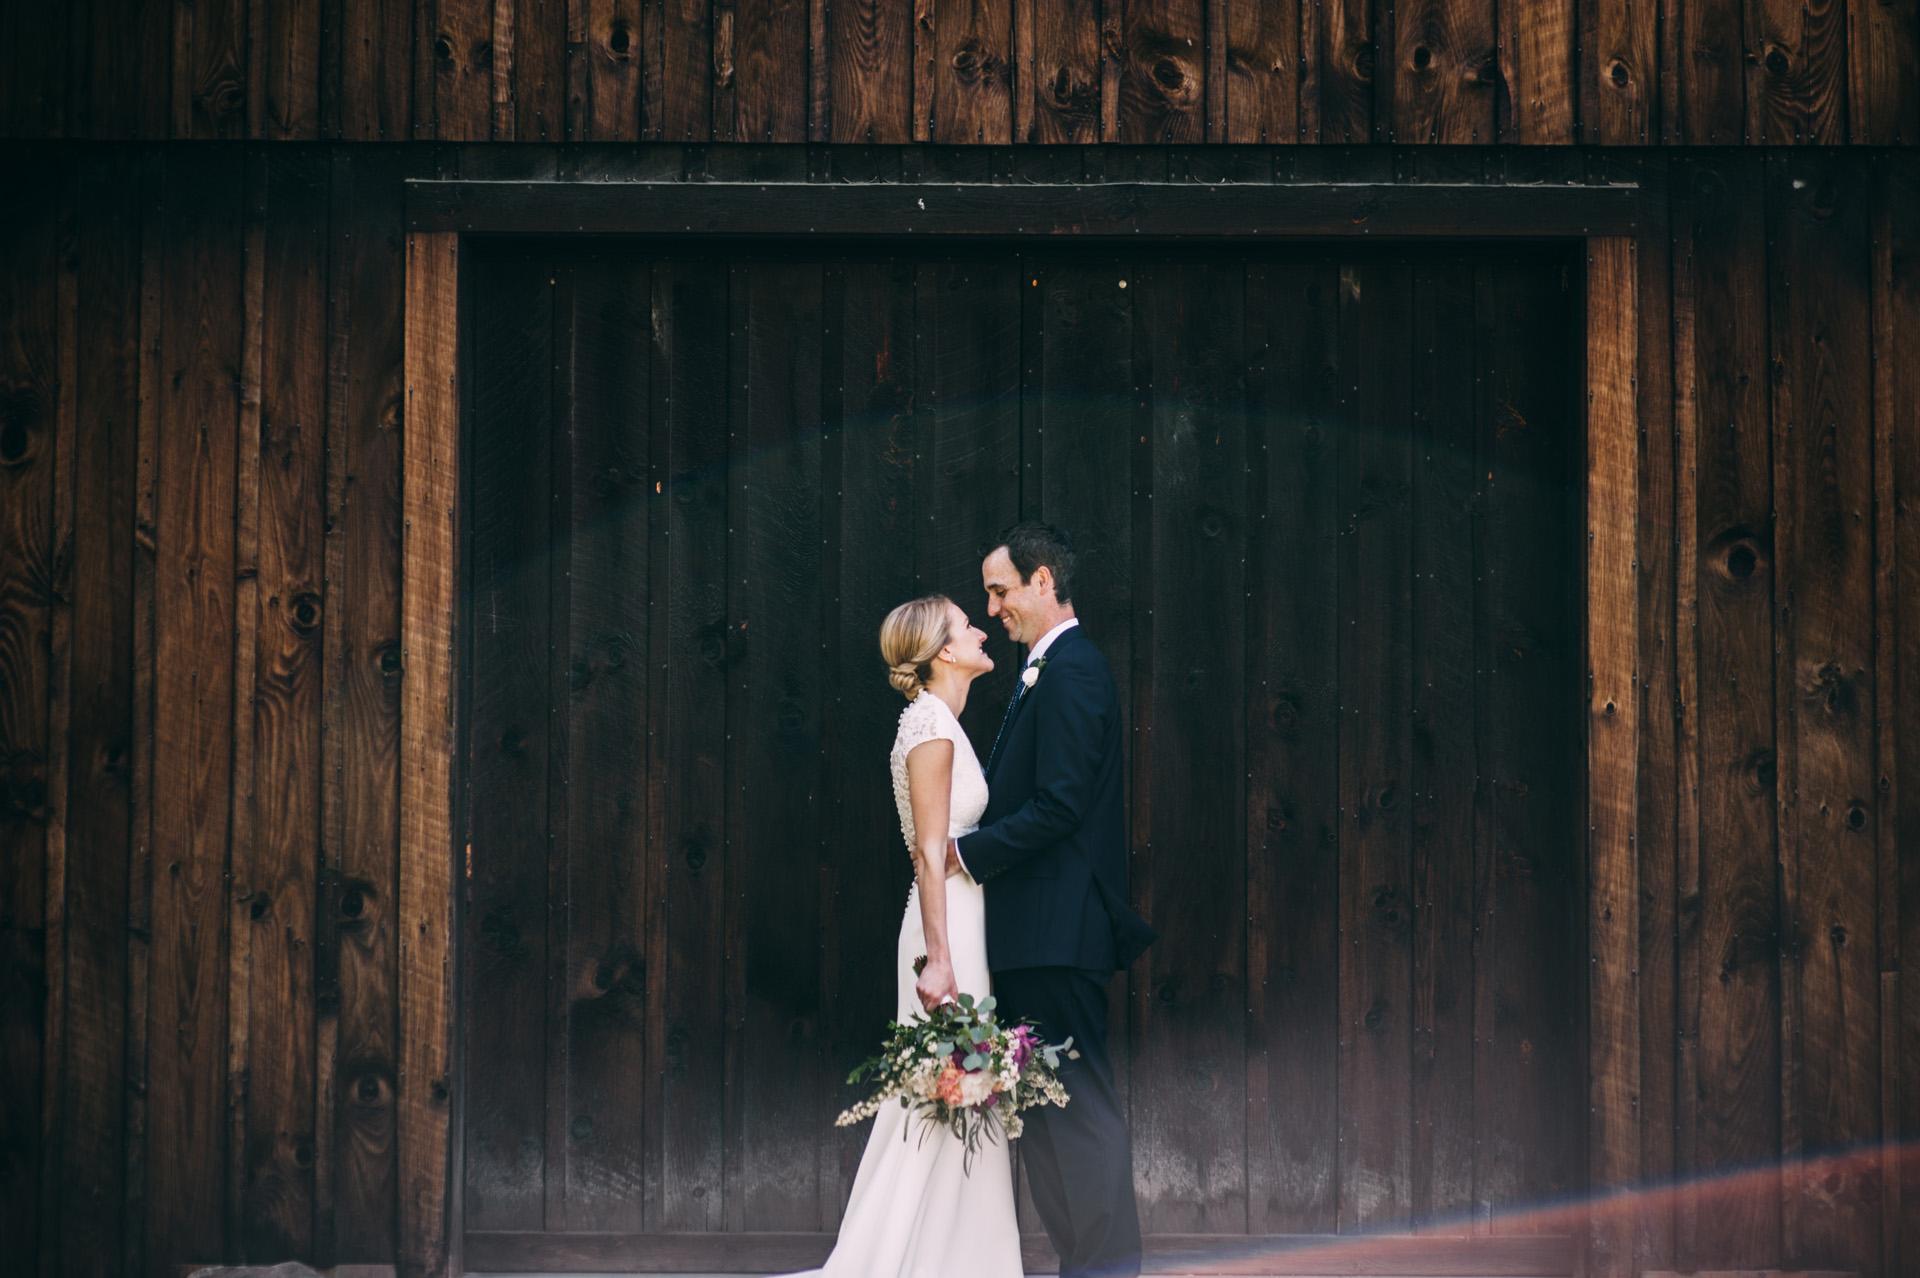 woodstock-inn-vermont-wedding-08